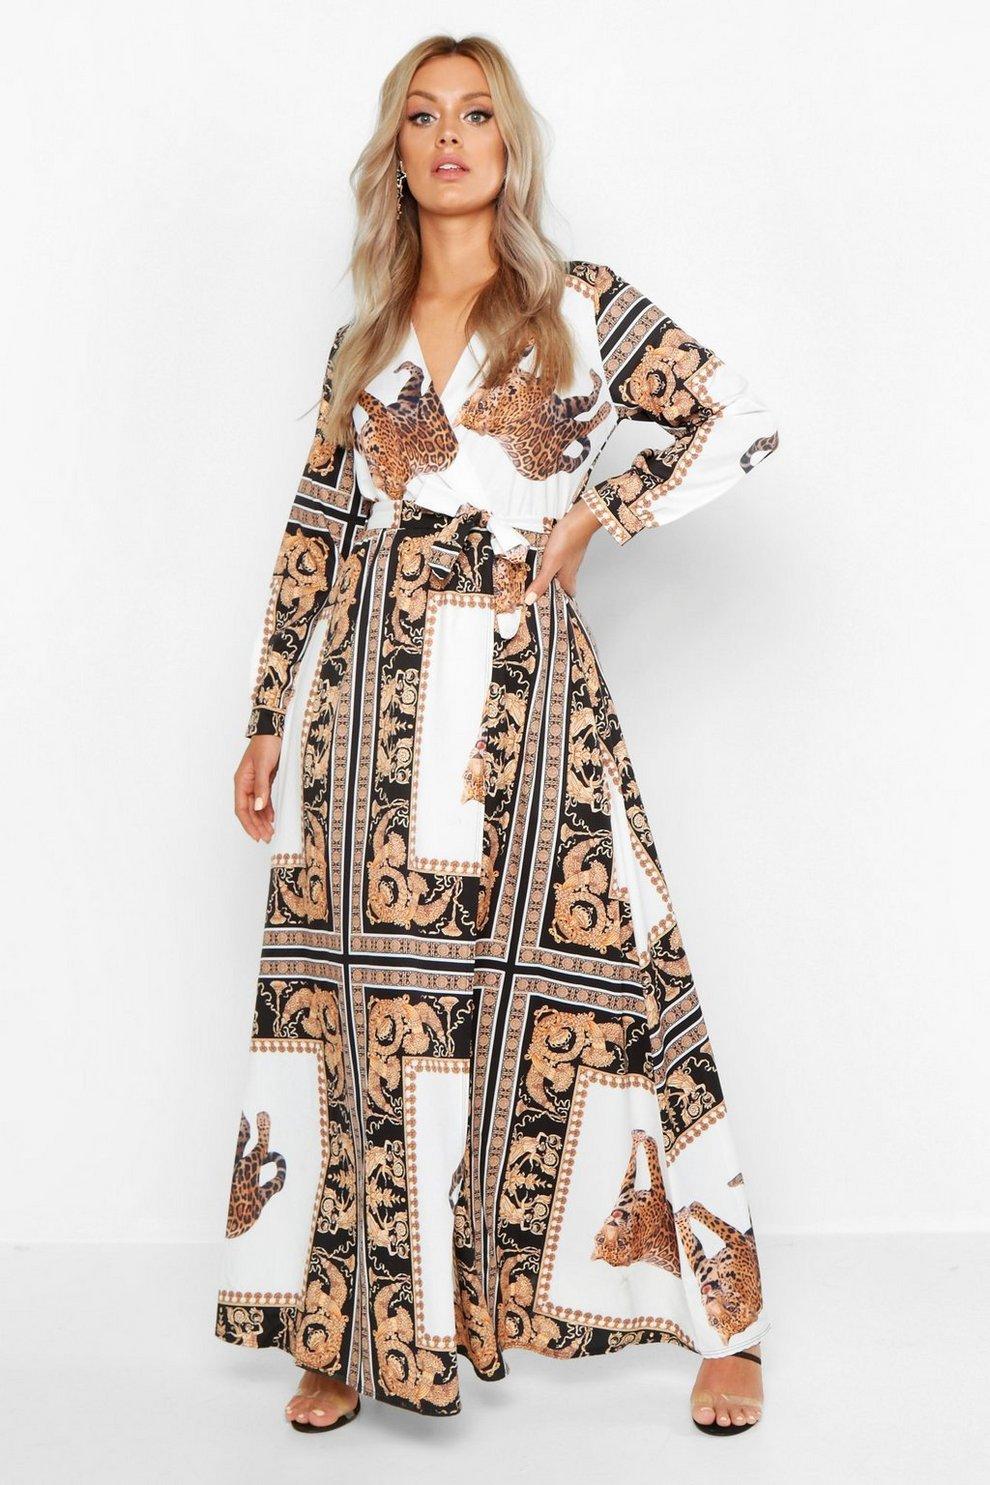 d600084ae6c Clearance Closeout Women s Maxi Dresses - Macy s